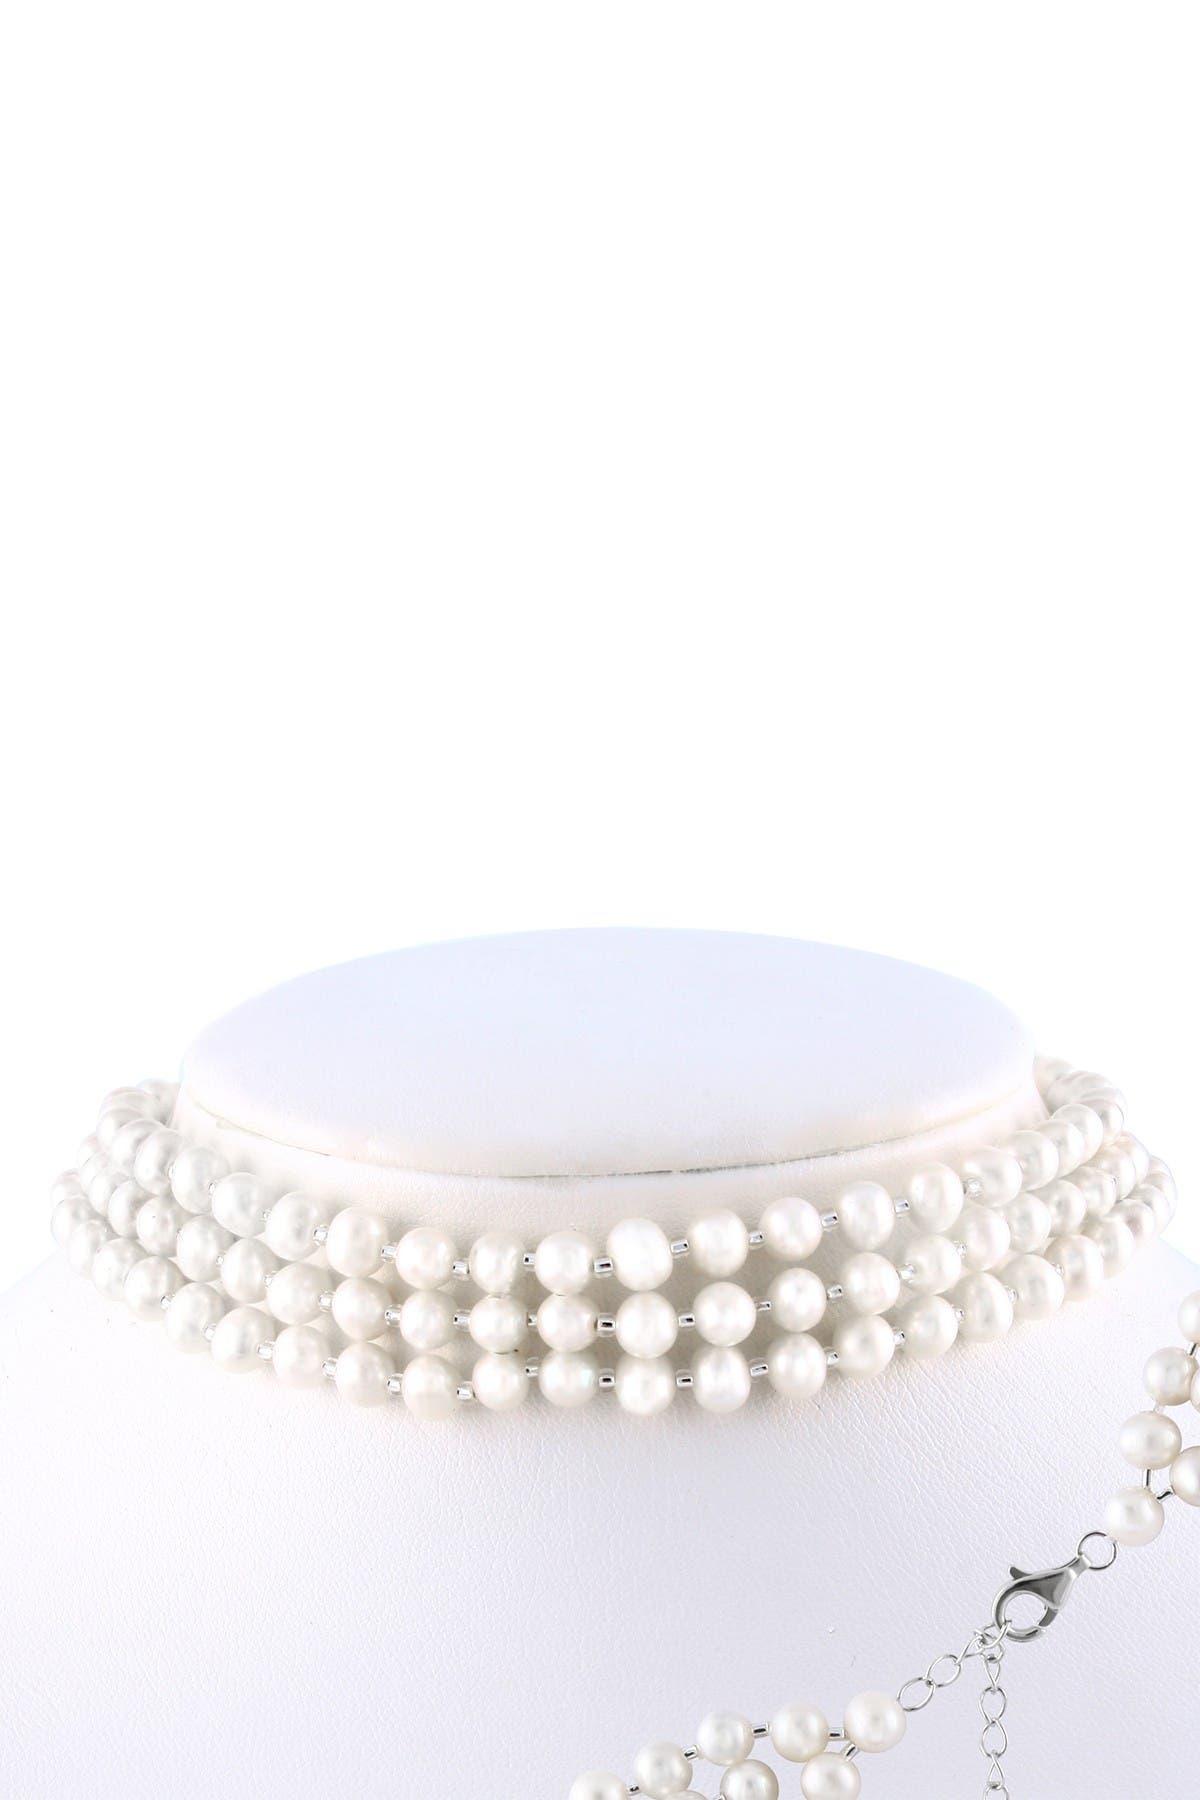 Image of Splendid Pearls 5-6mm Freshwater Pearl Triple Row Choker Necklace